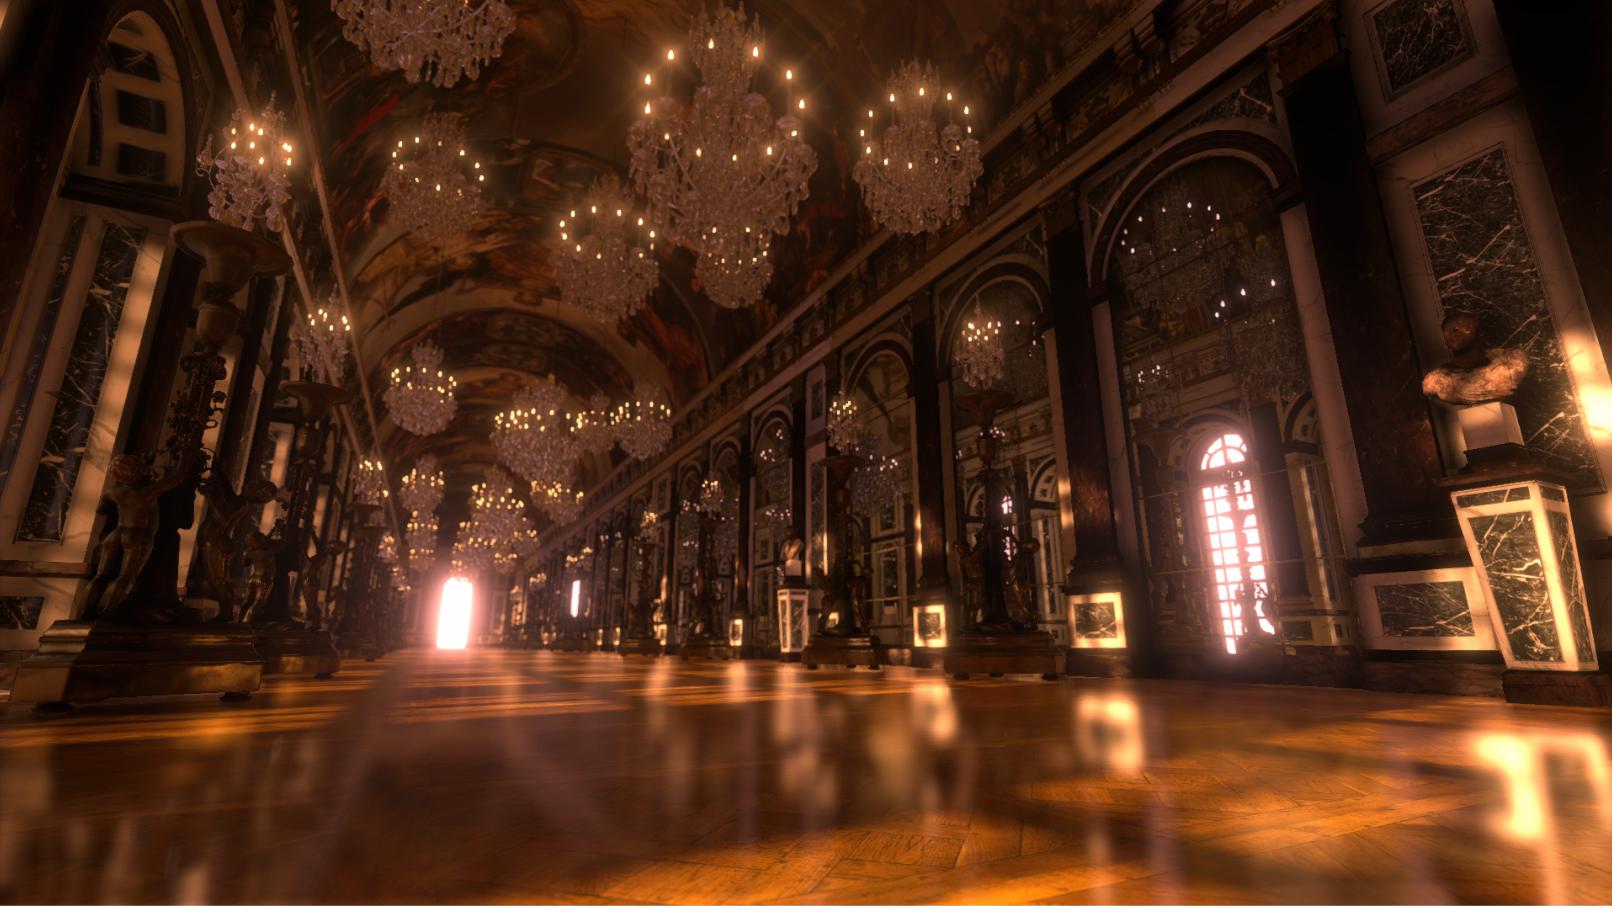 Versailles like corridor